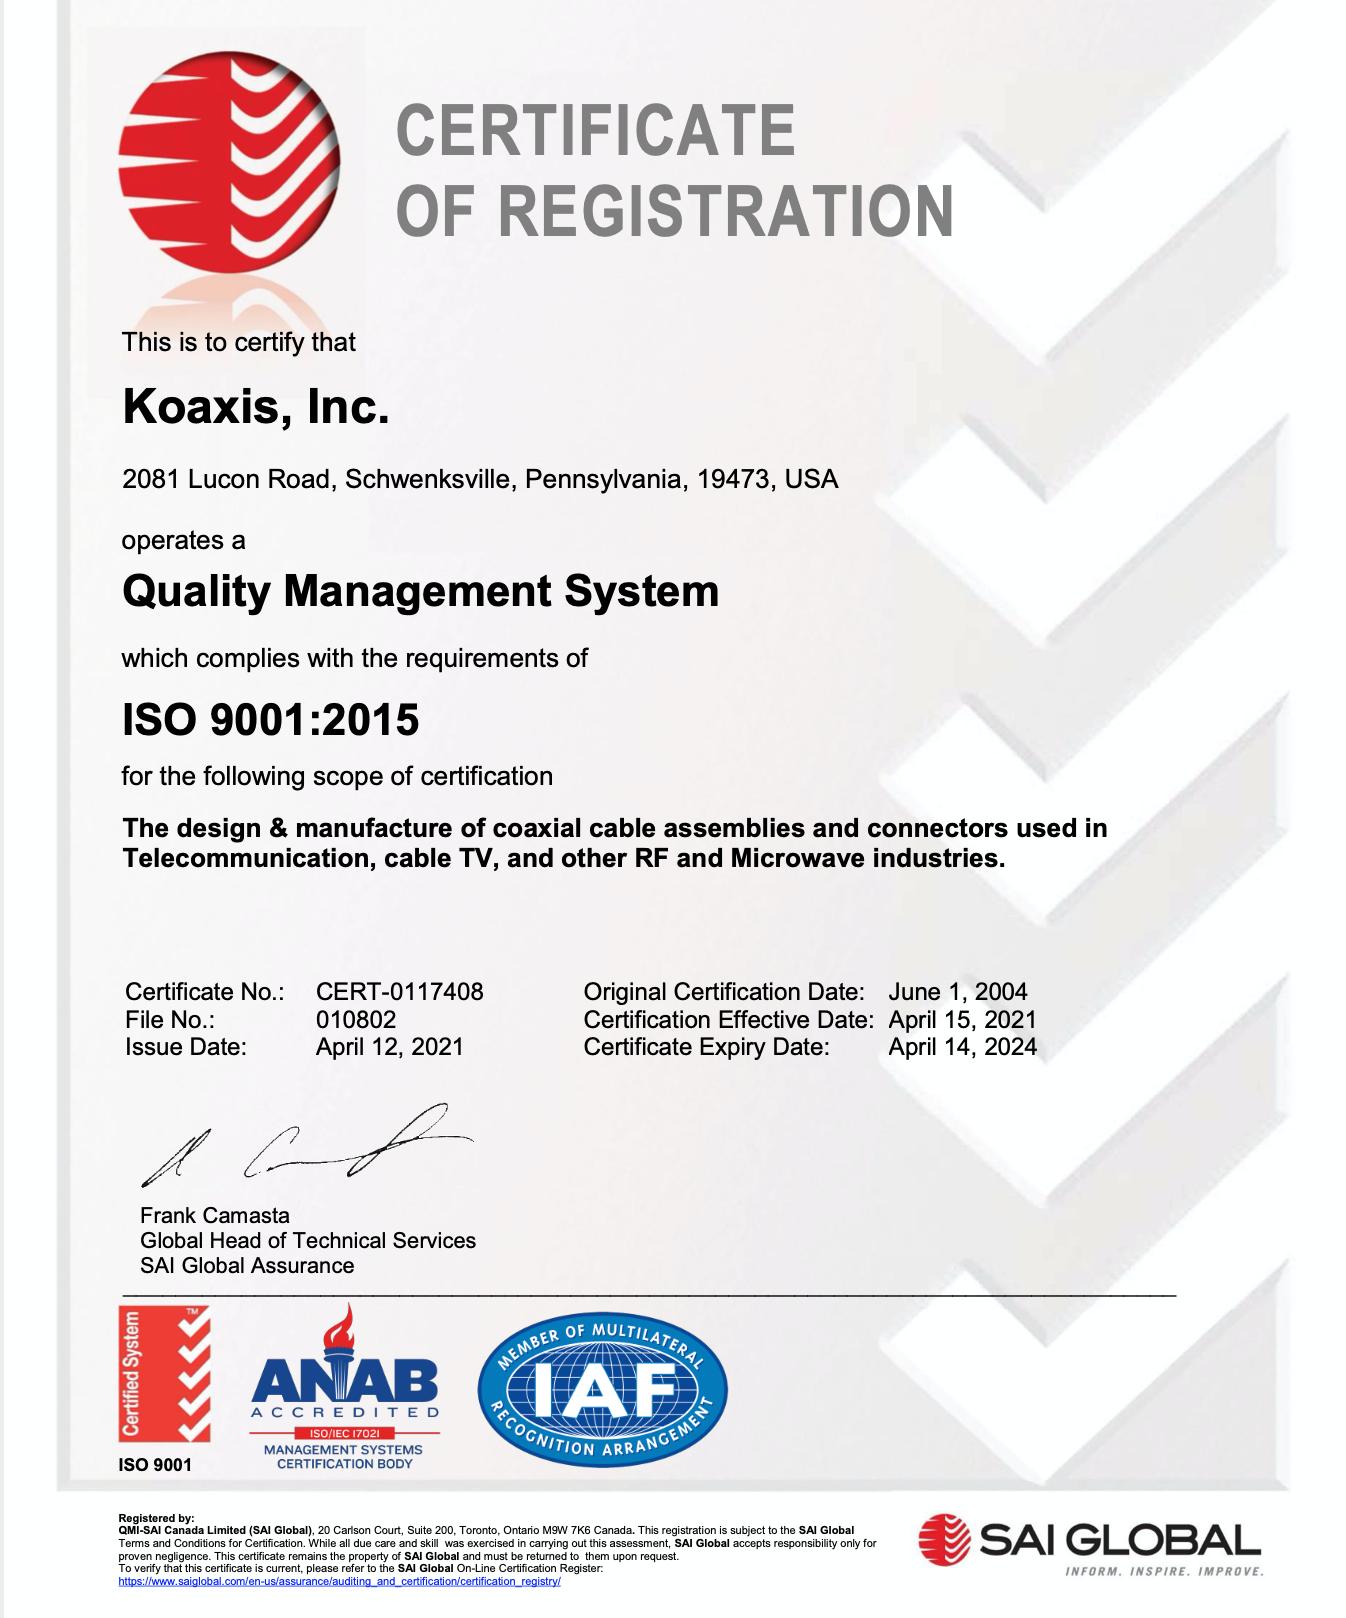 sai global iso 9001 2015 certificate koaxis